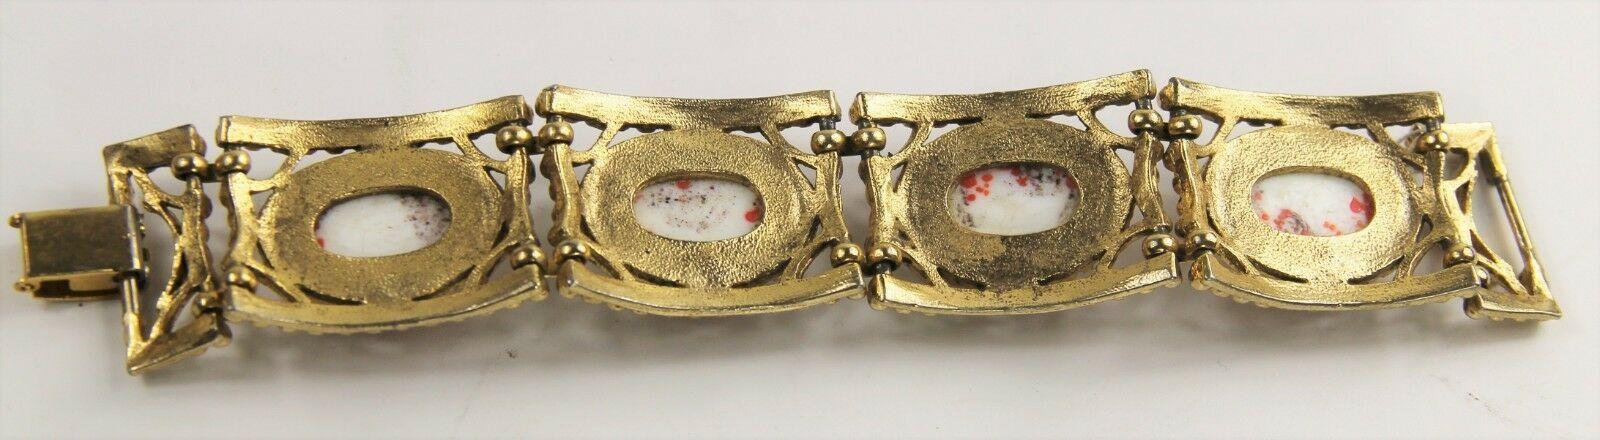 "7"" VINTAGE Jewelry 70's CHUNKY ORANGE SPECKLED GLASS CABOCHON BRACELET RETRO"